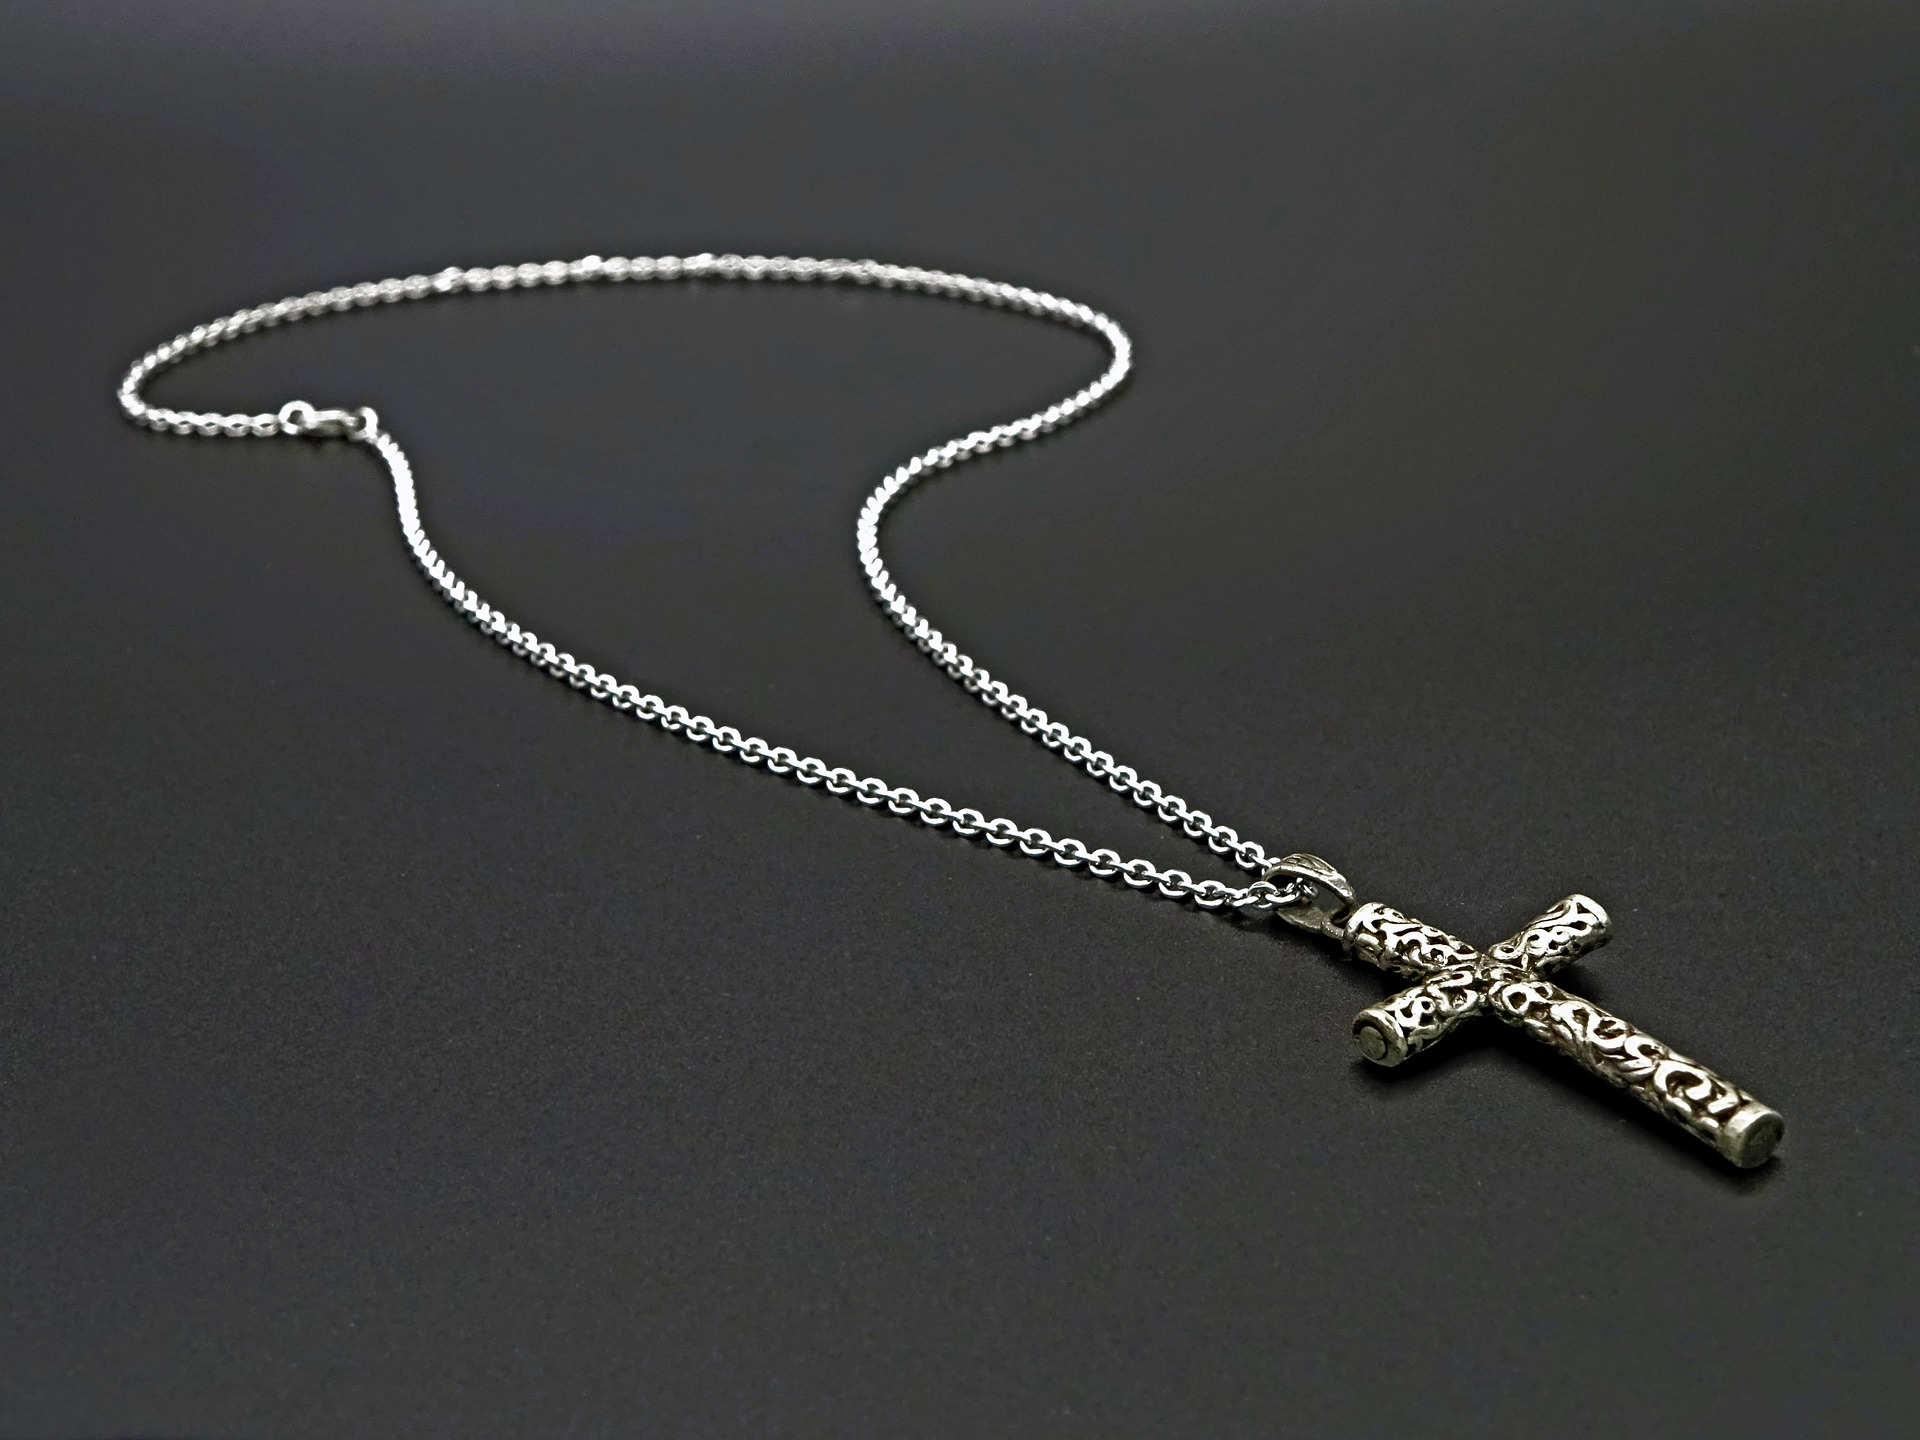 Cross chain photo